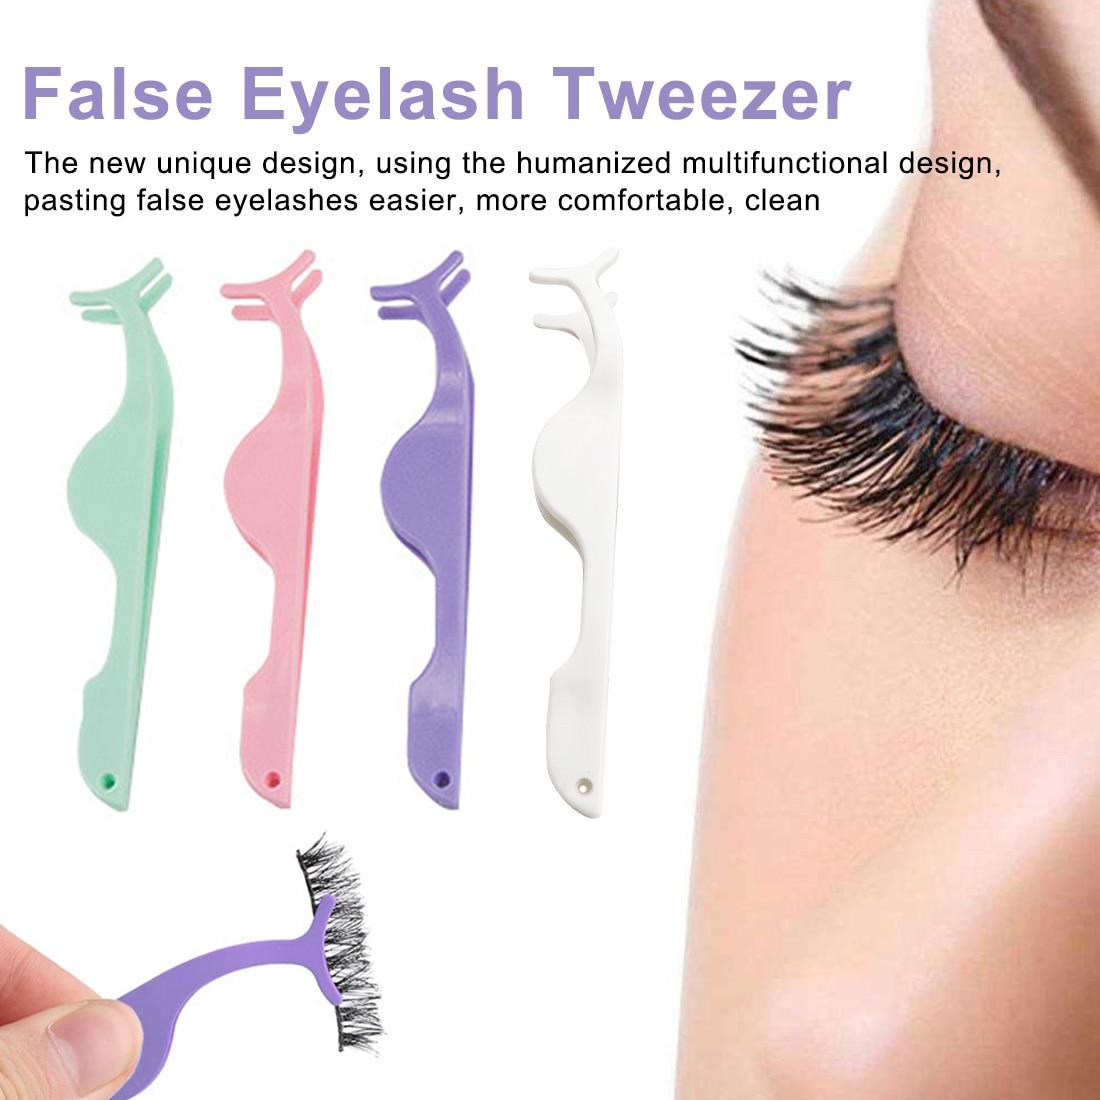 White 1 Pcs Clamp Makeup Forceps Tools Tweezers Fake Eye Lash Applicator Eyelash Extension Curler Nipper Auxiliary Clip